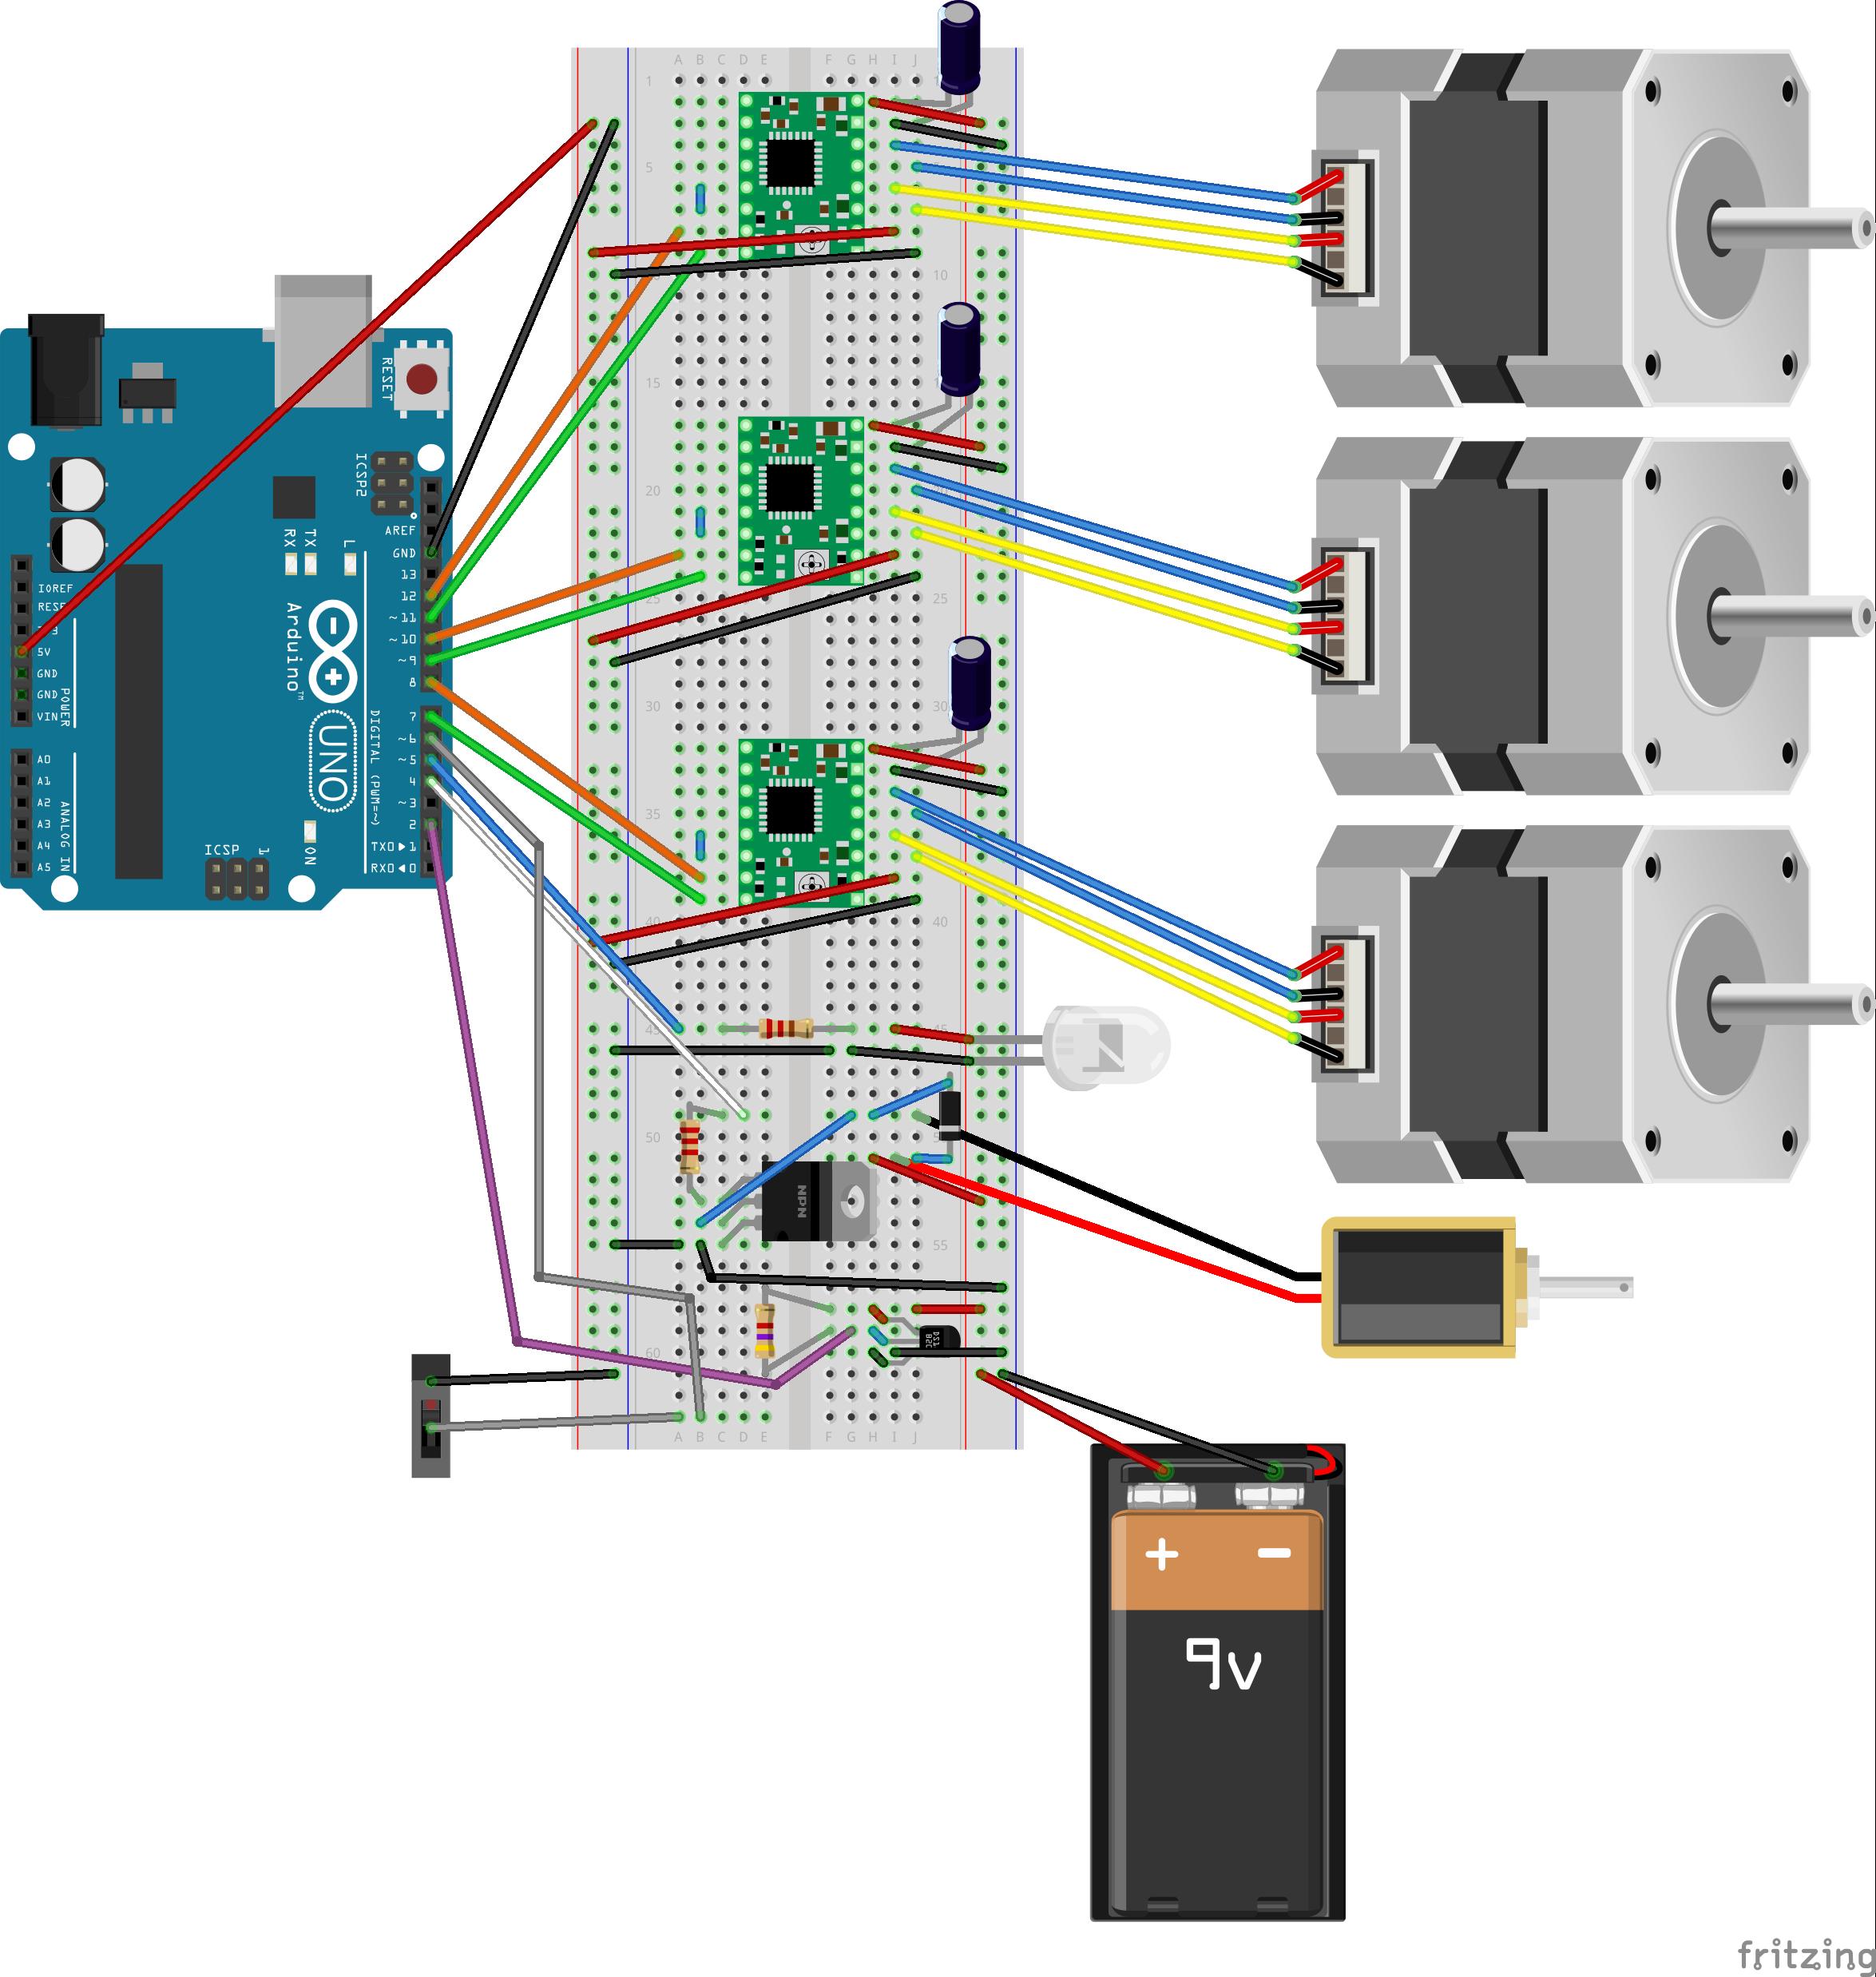 fritzing diagram of final circuit